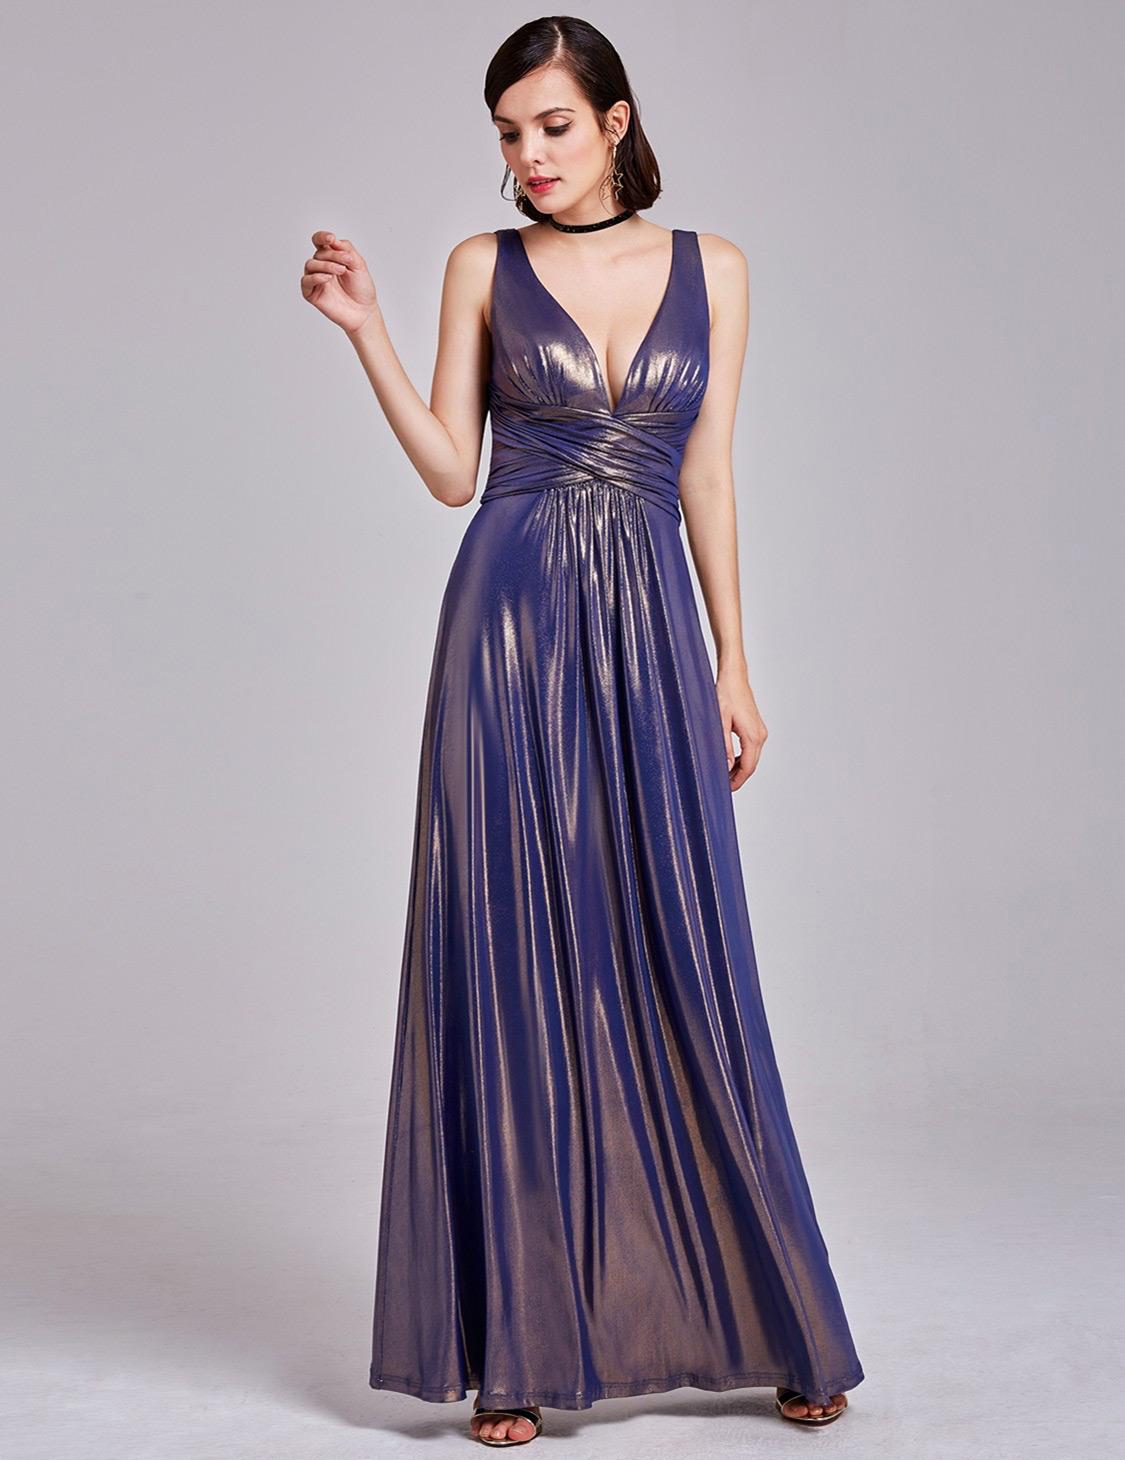 purple metallic evening dress